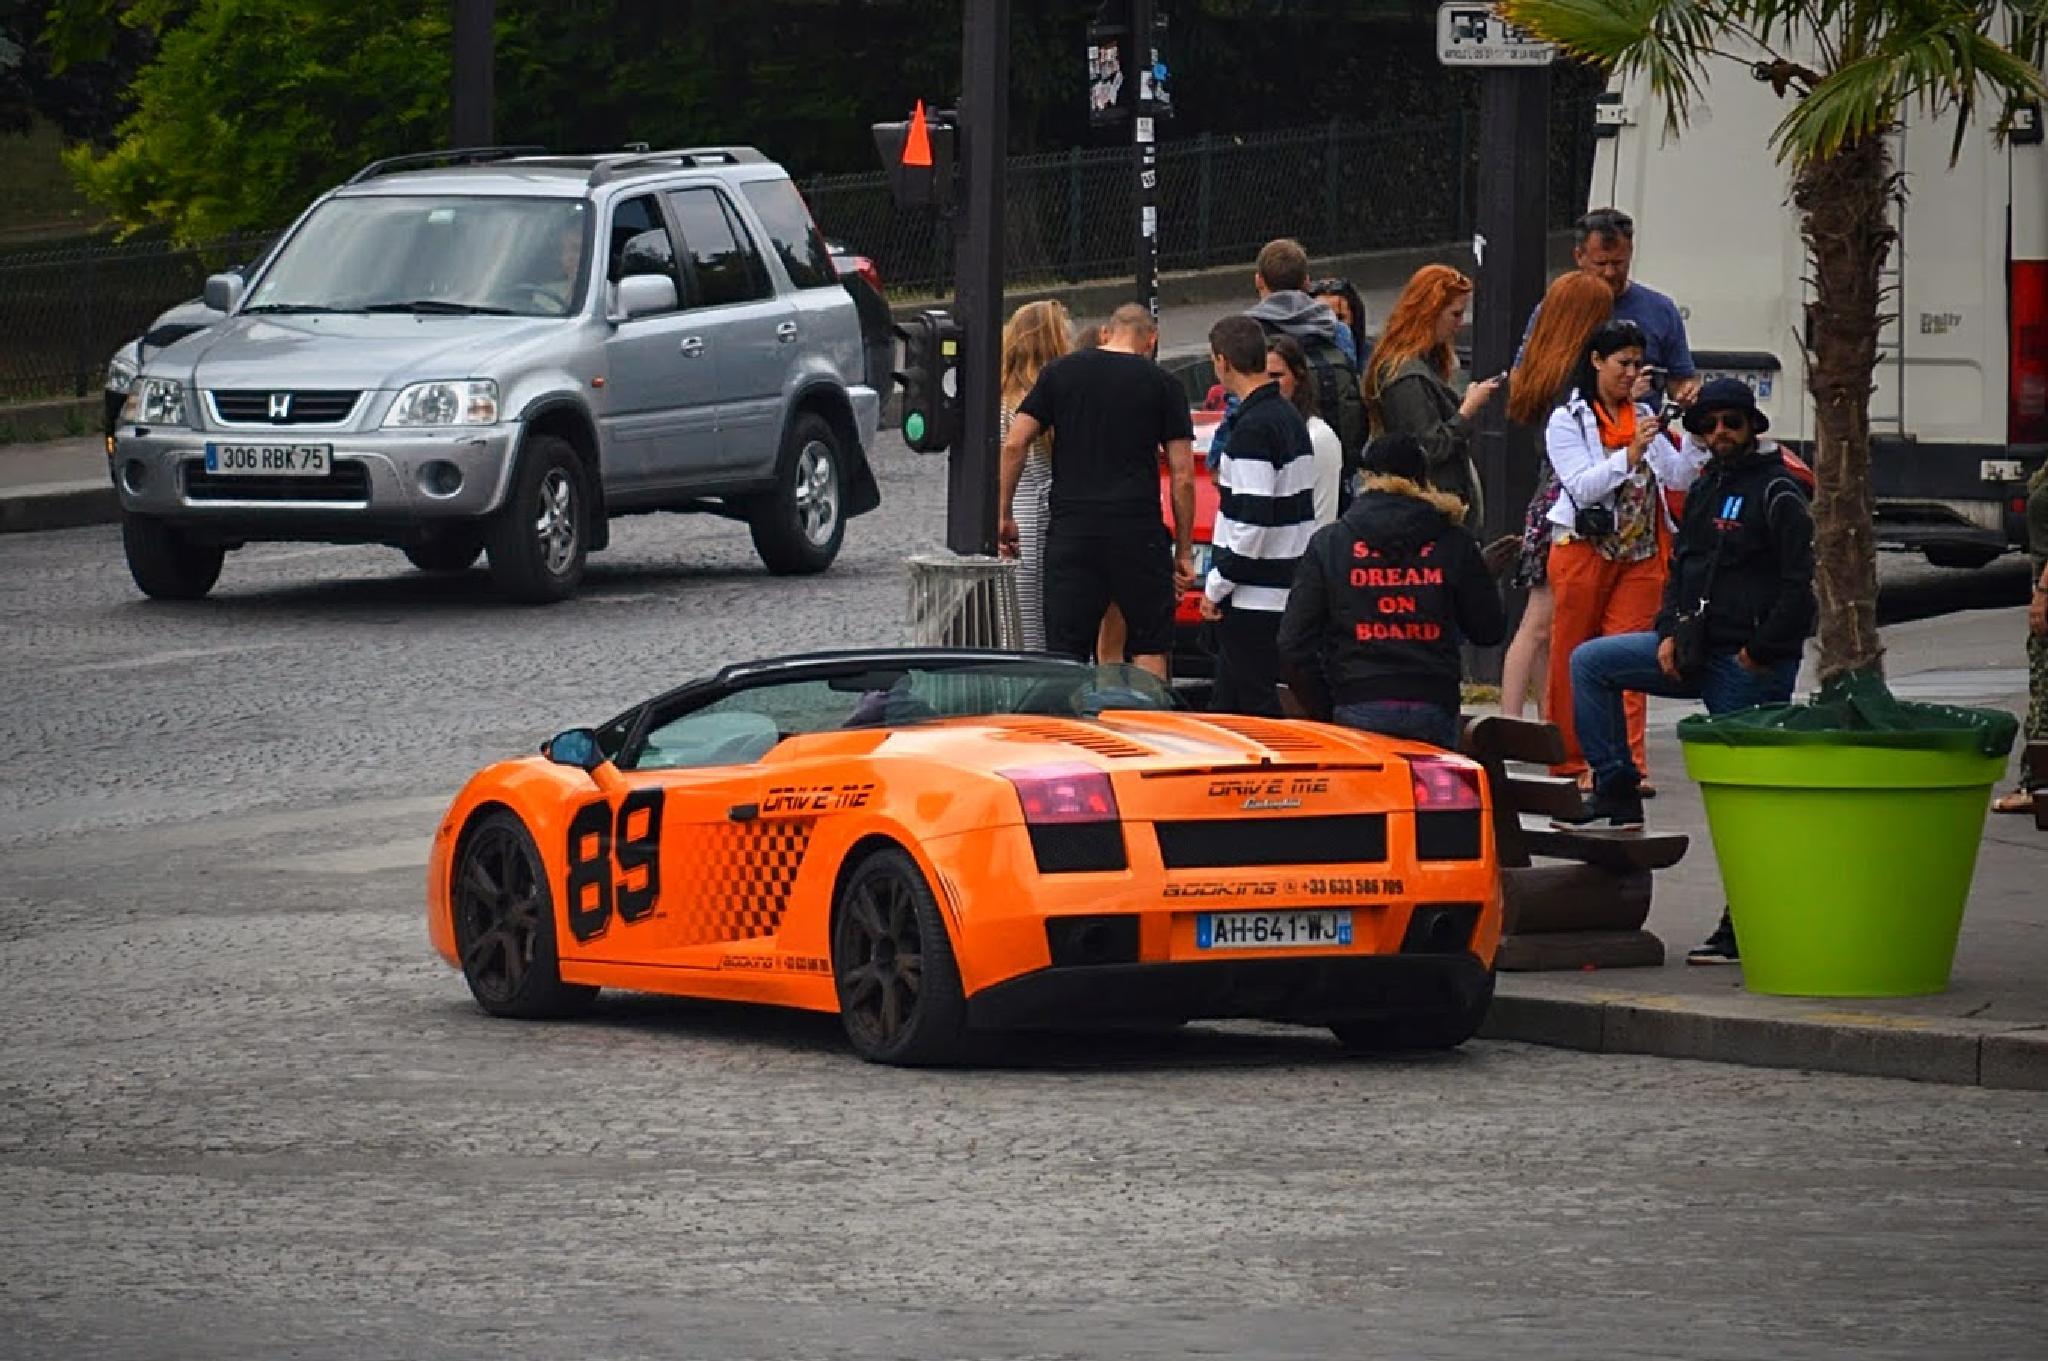 Lamborghini - Paris by drcarlosesparza